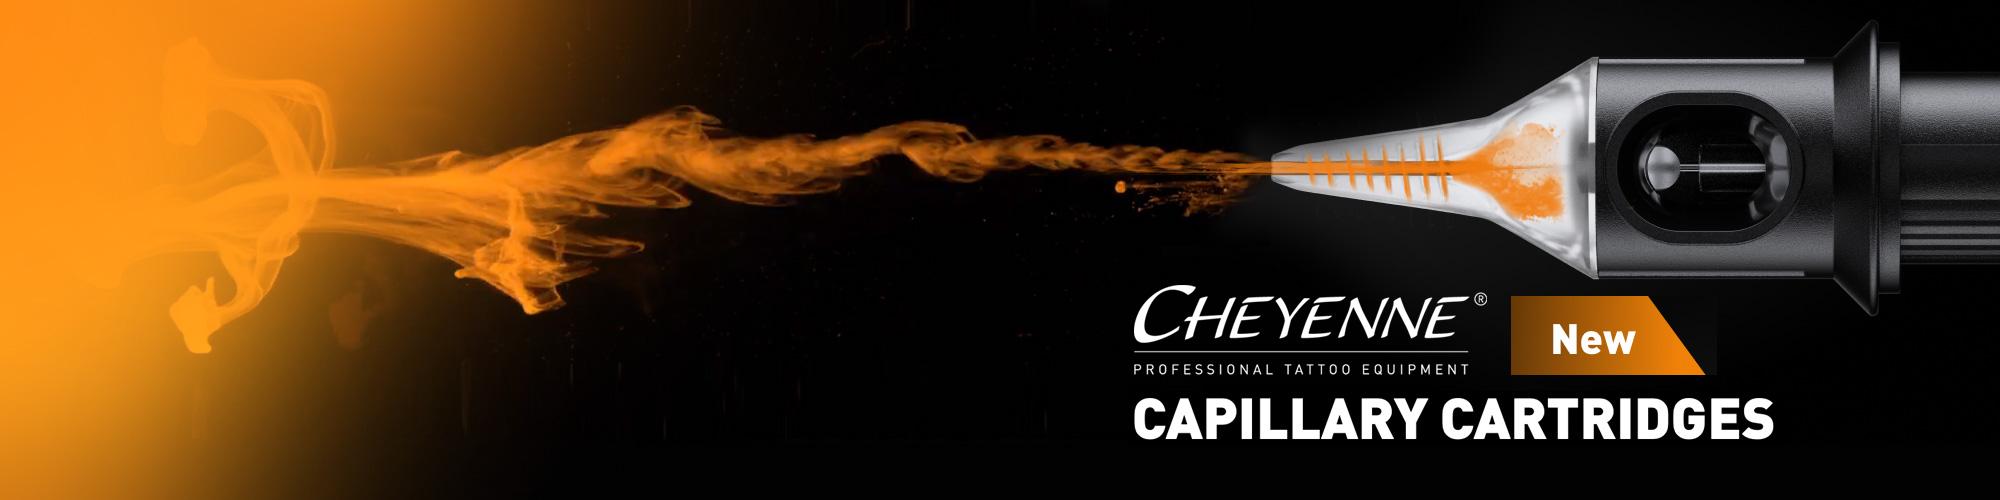 CHEYENNE CAPILLARY CARTRIDGES